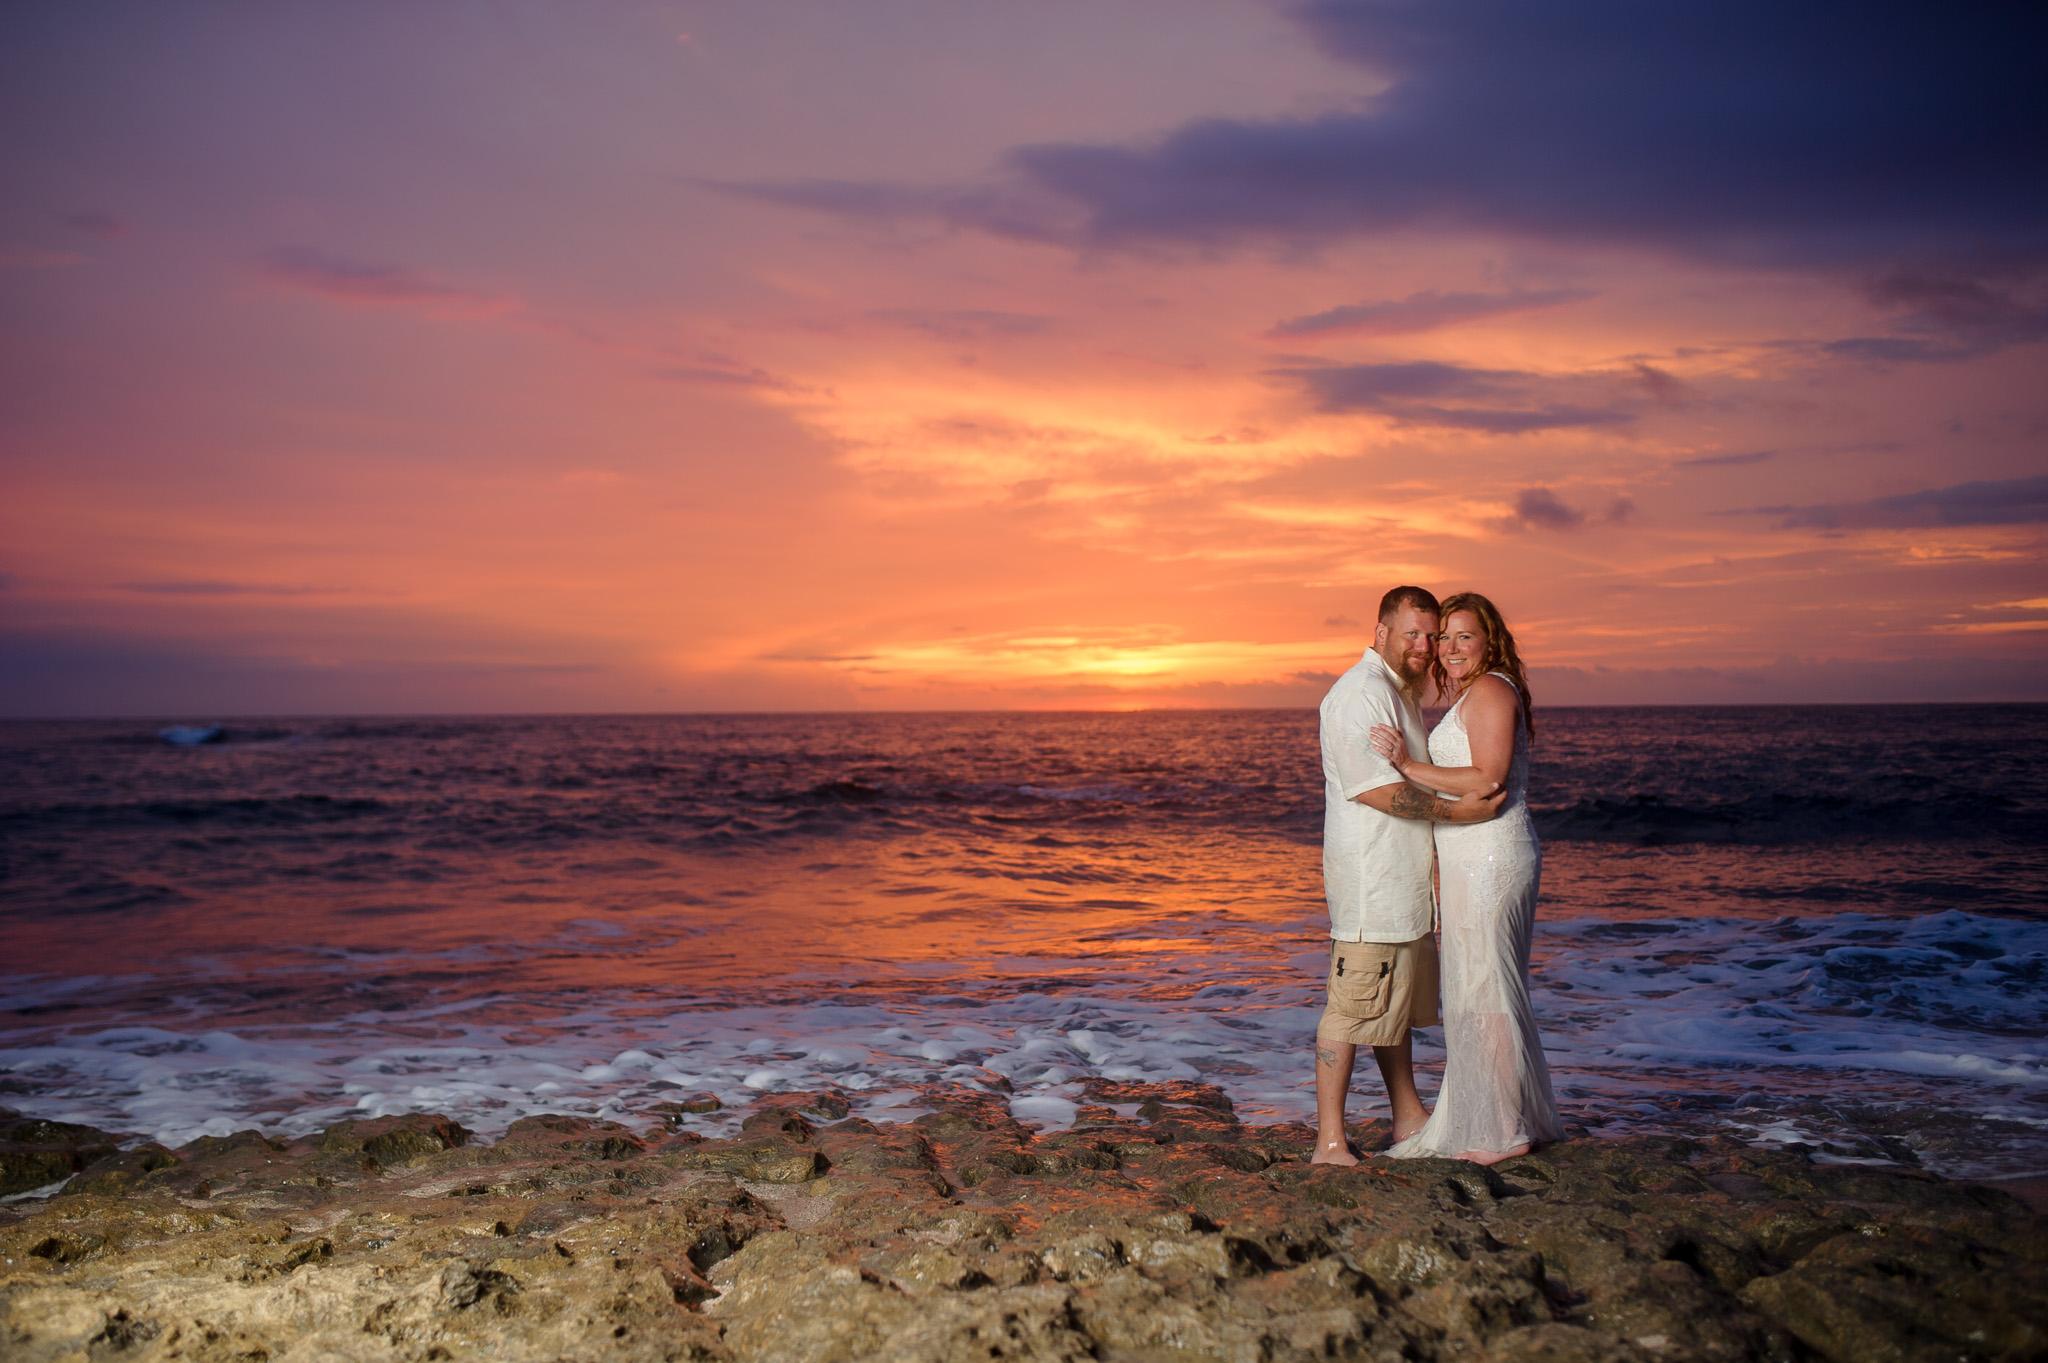 sunset costa rica photography love